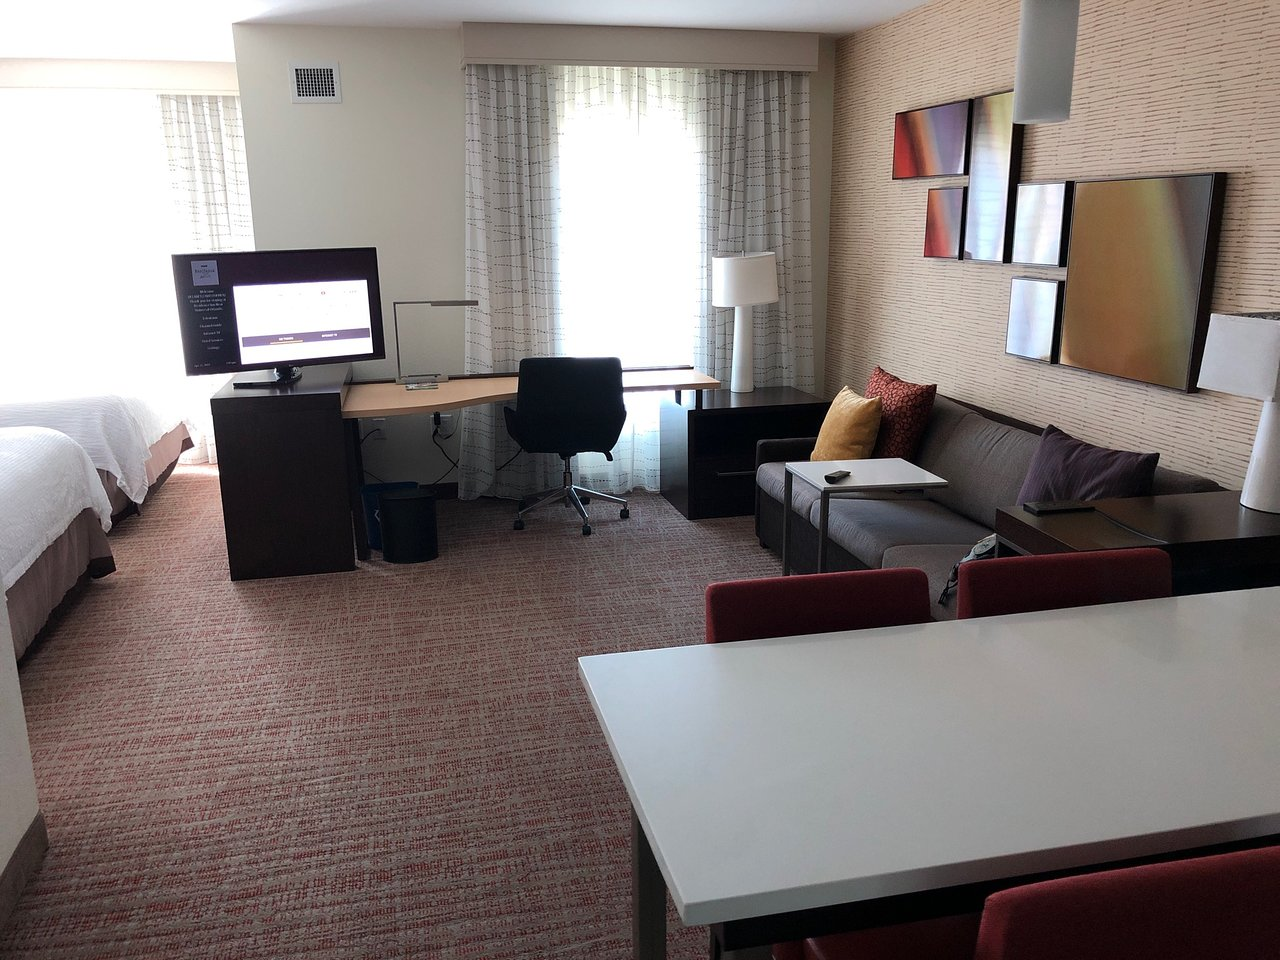 residence inn near universal orlando 118 1 9 5 updated 2019 rh tripadvisor com